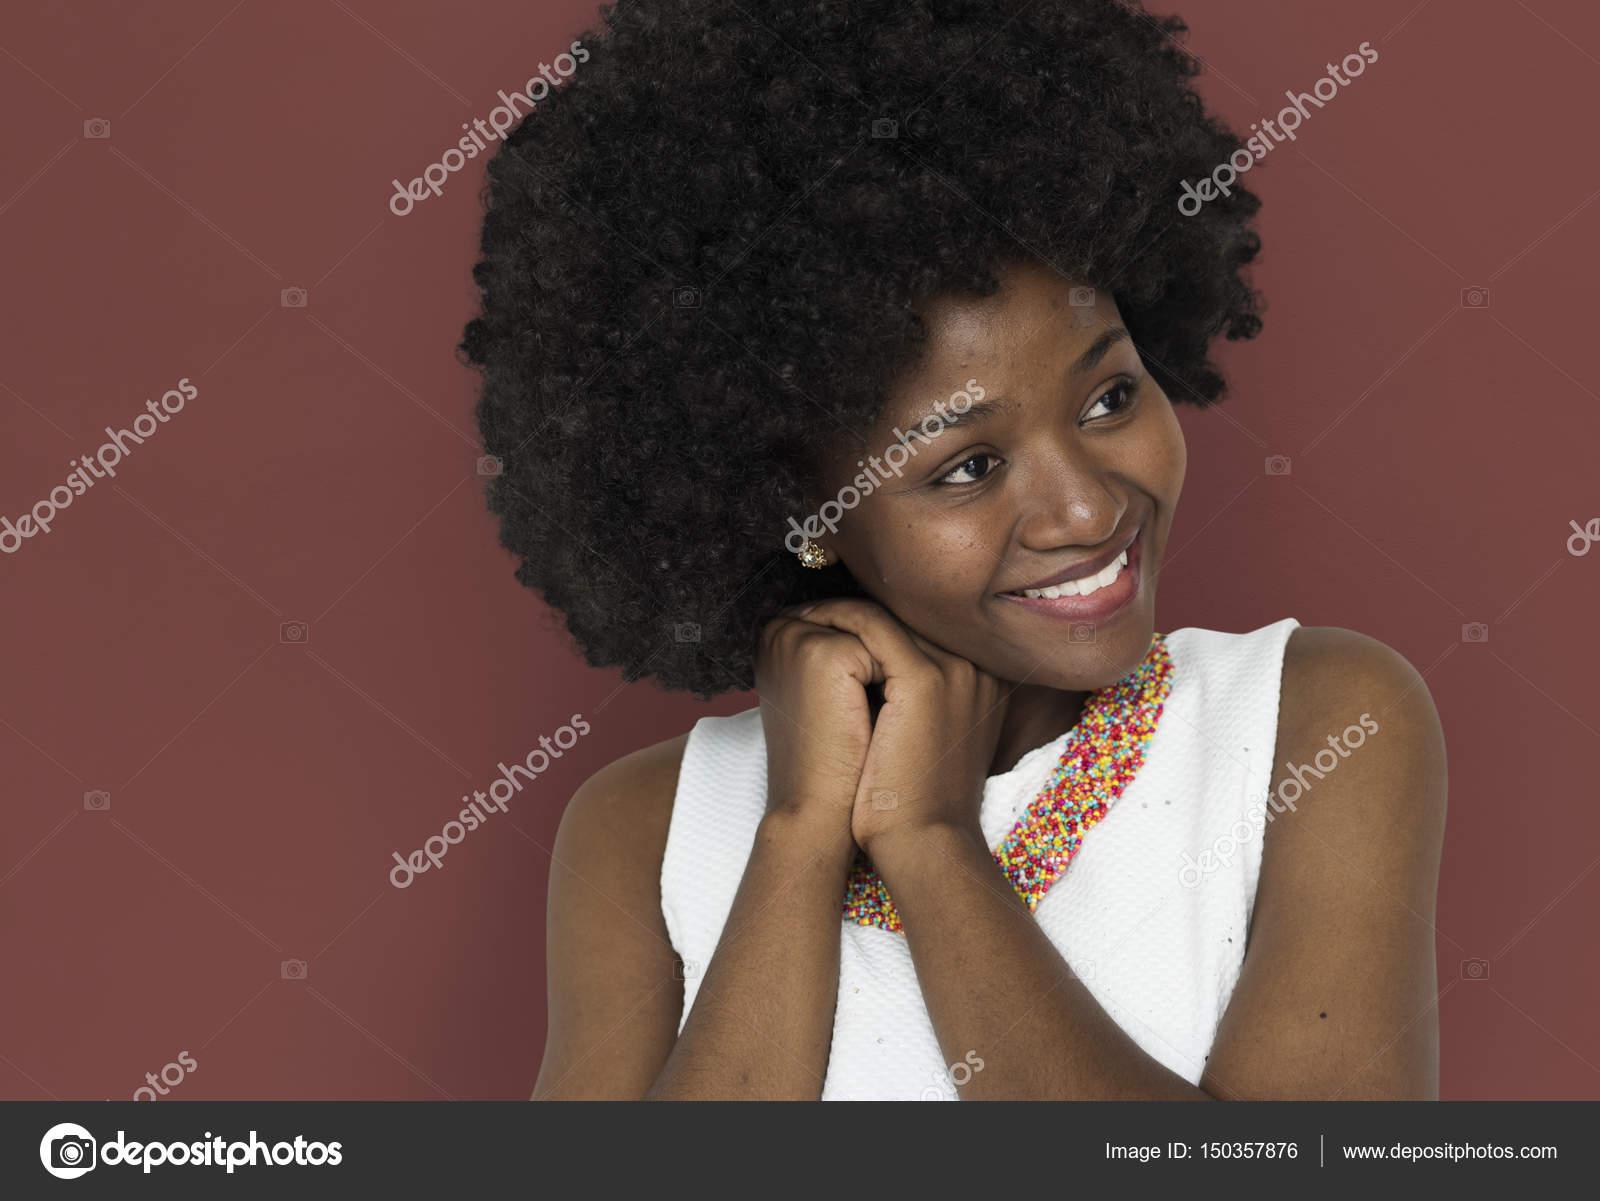 Fotos Peinados Afro Para Mujeres Mujer Con Peinado Afro Foto